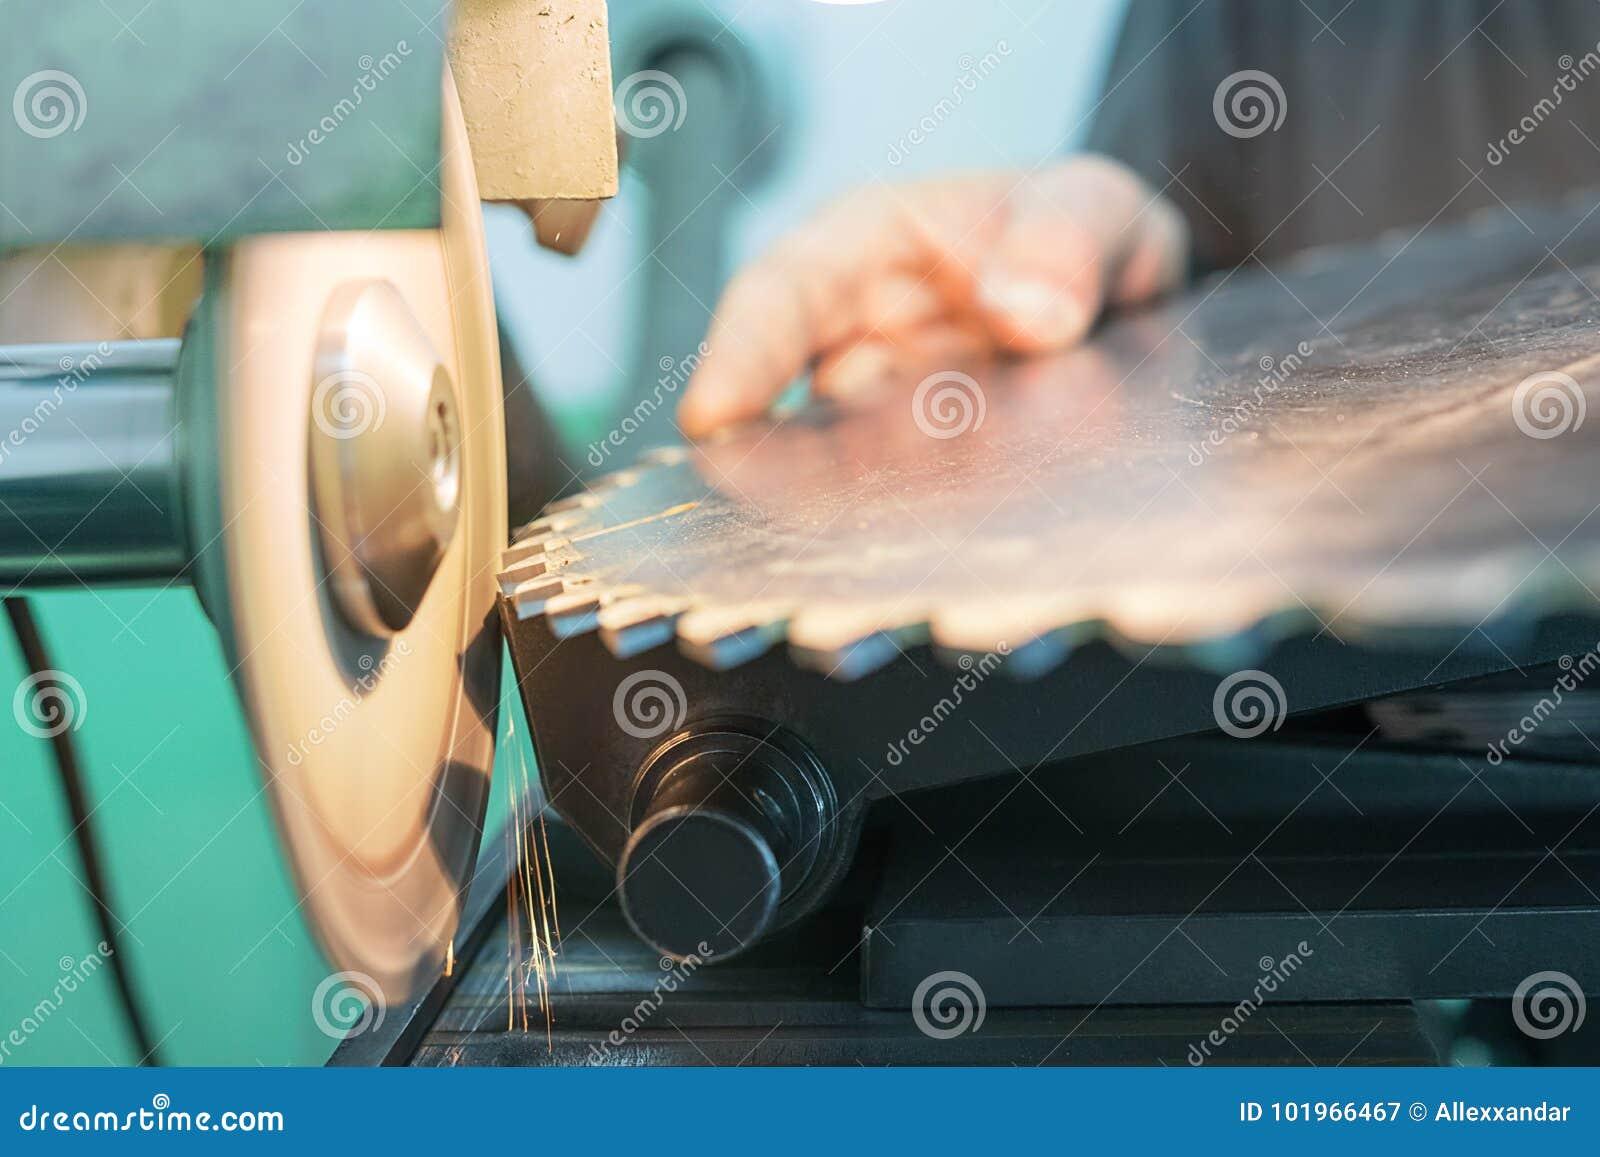 Apontando a circular viu, trabalhador aponta uma lâmina de serra circular